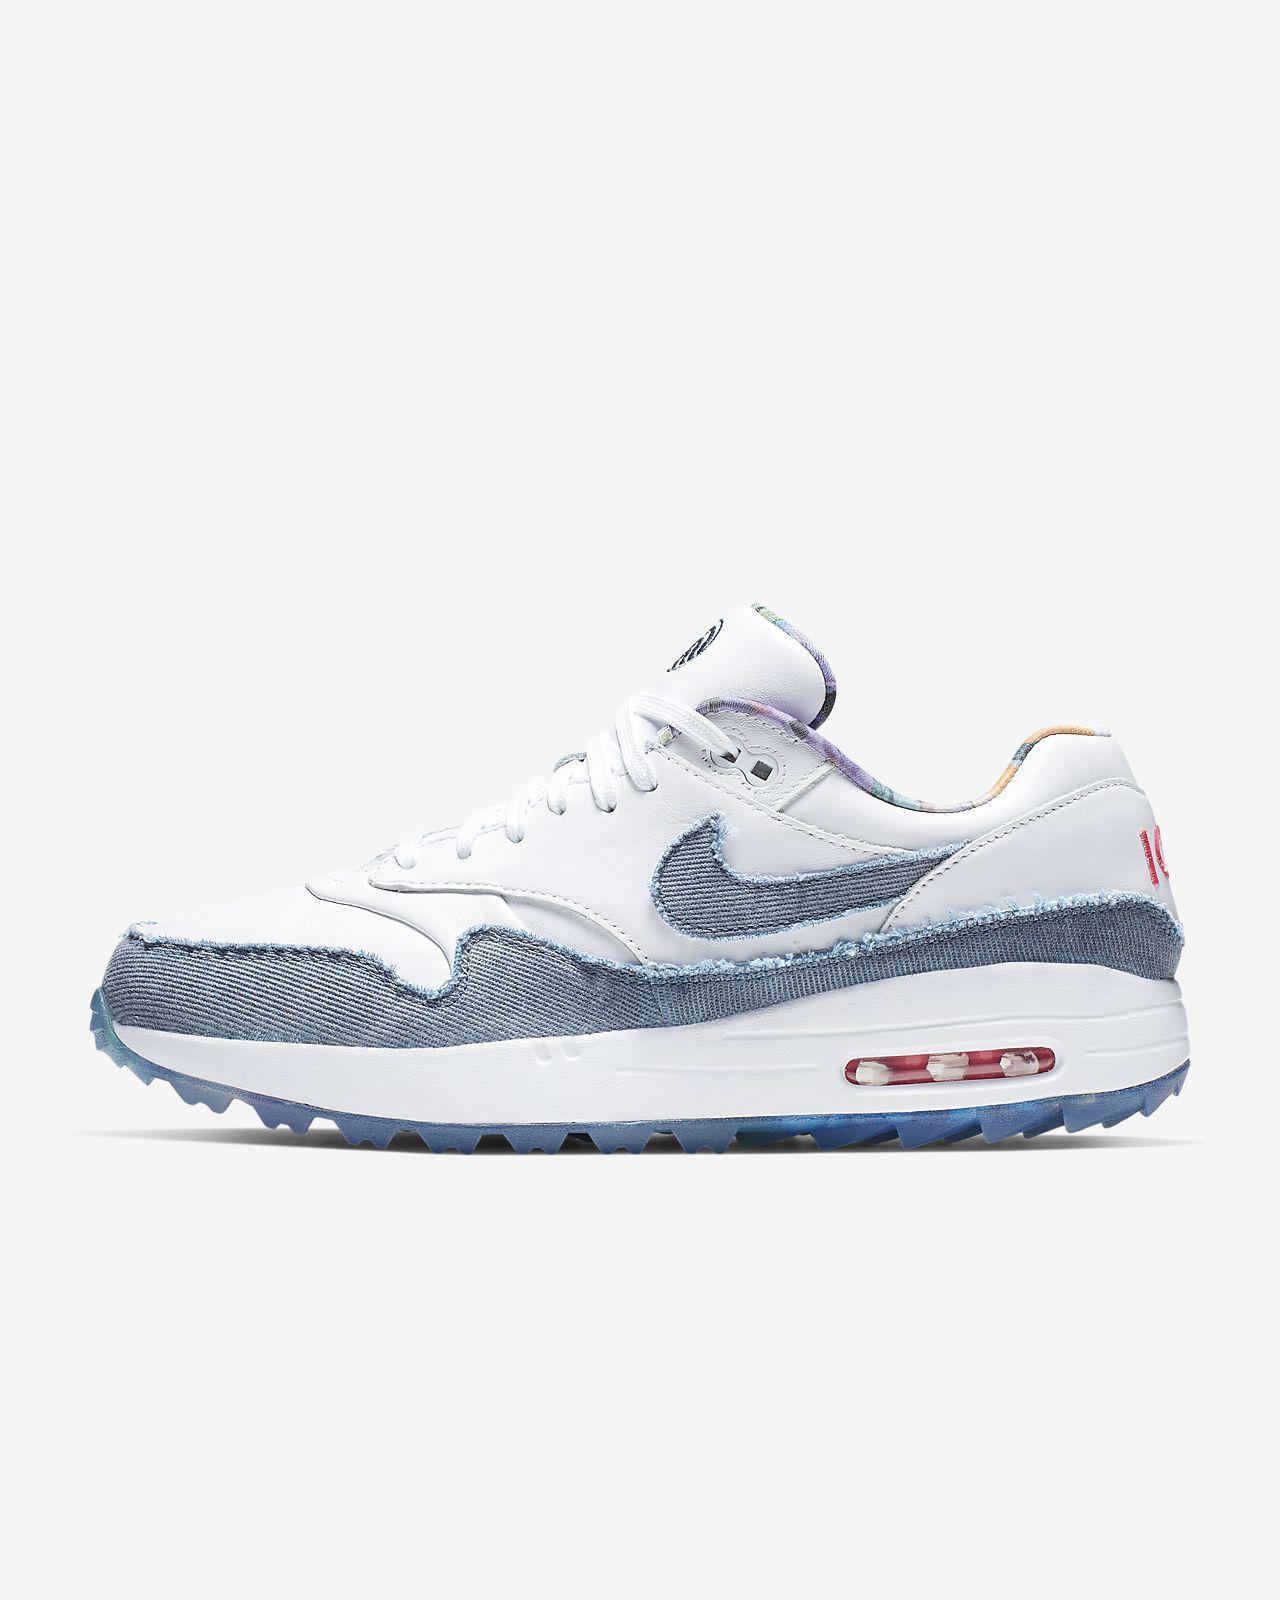 84898691 Мужские кроссовки для гольфа Nike Air Max 1 G NRG. Nike.com RU